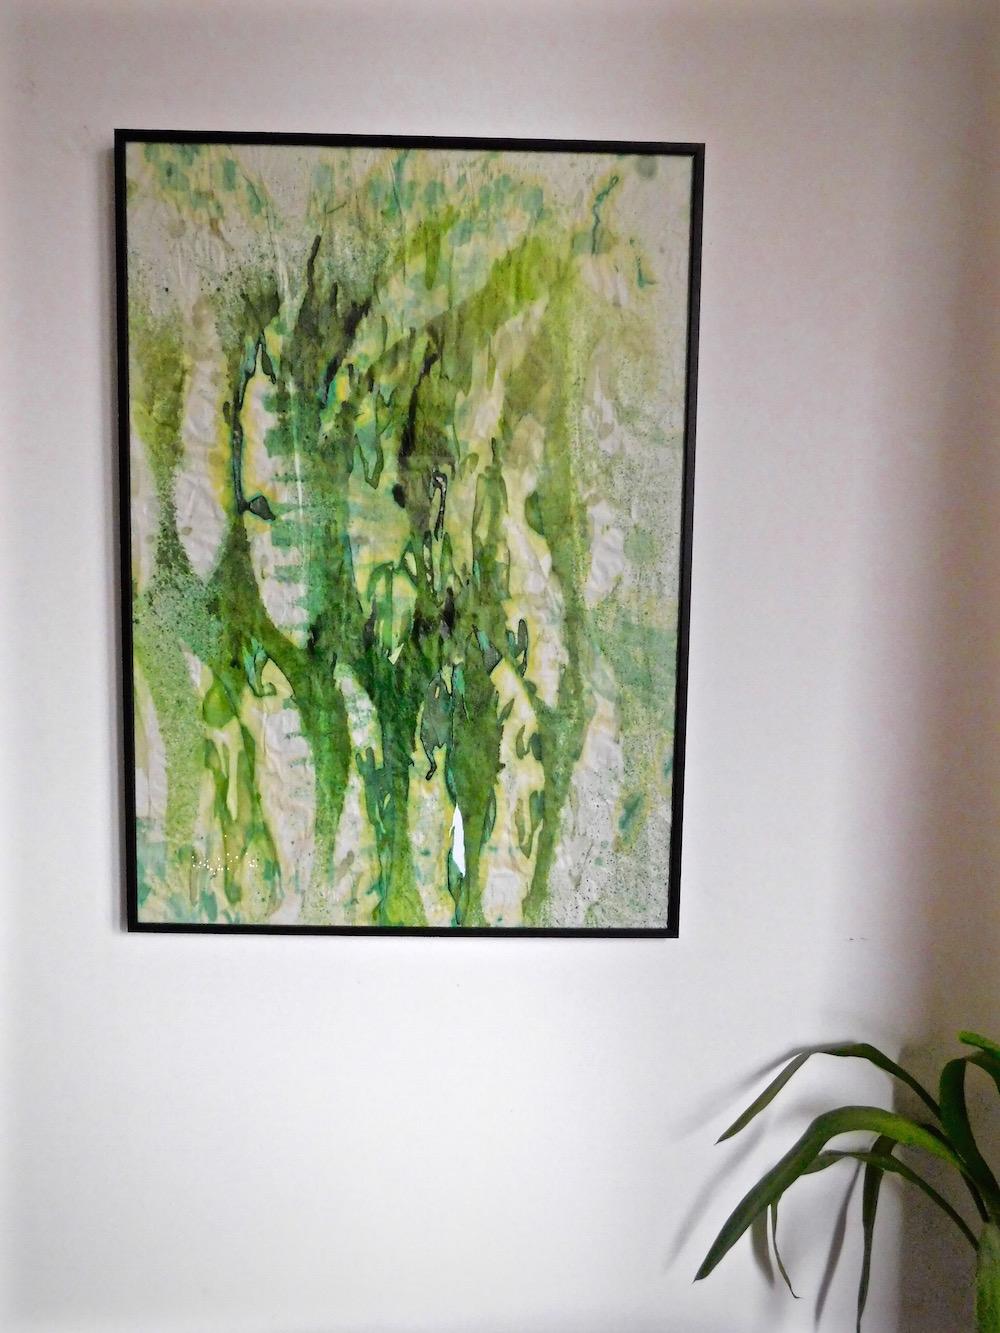 Emily Henson diy art close-up